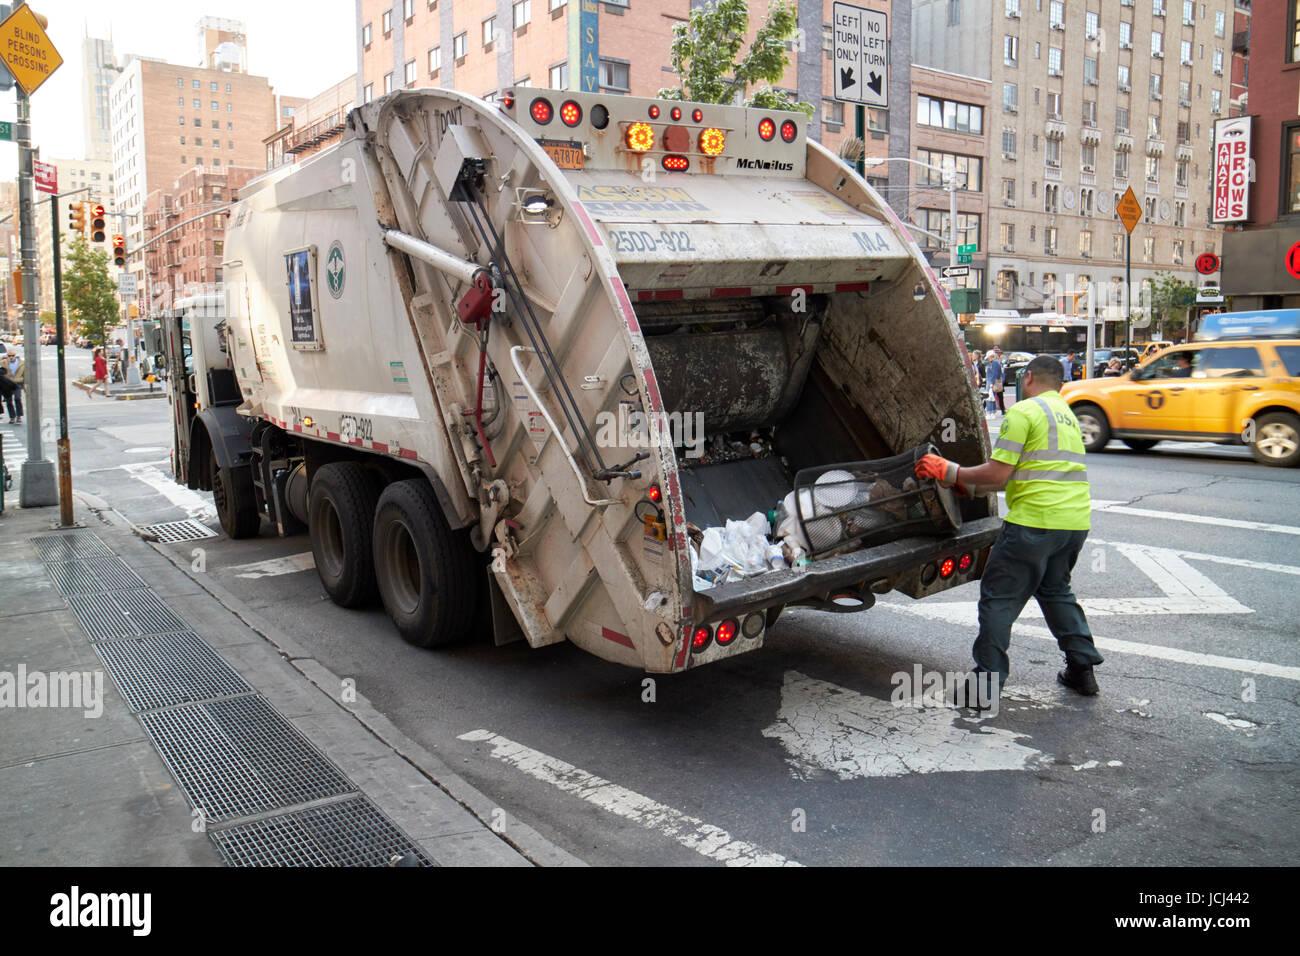 New York City Sanitation Truck Worker Emptying Street Bins